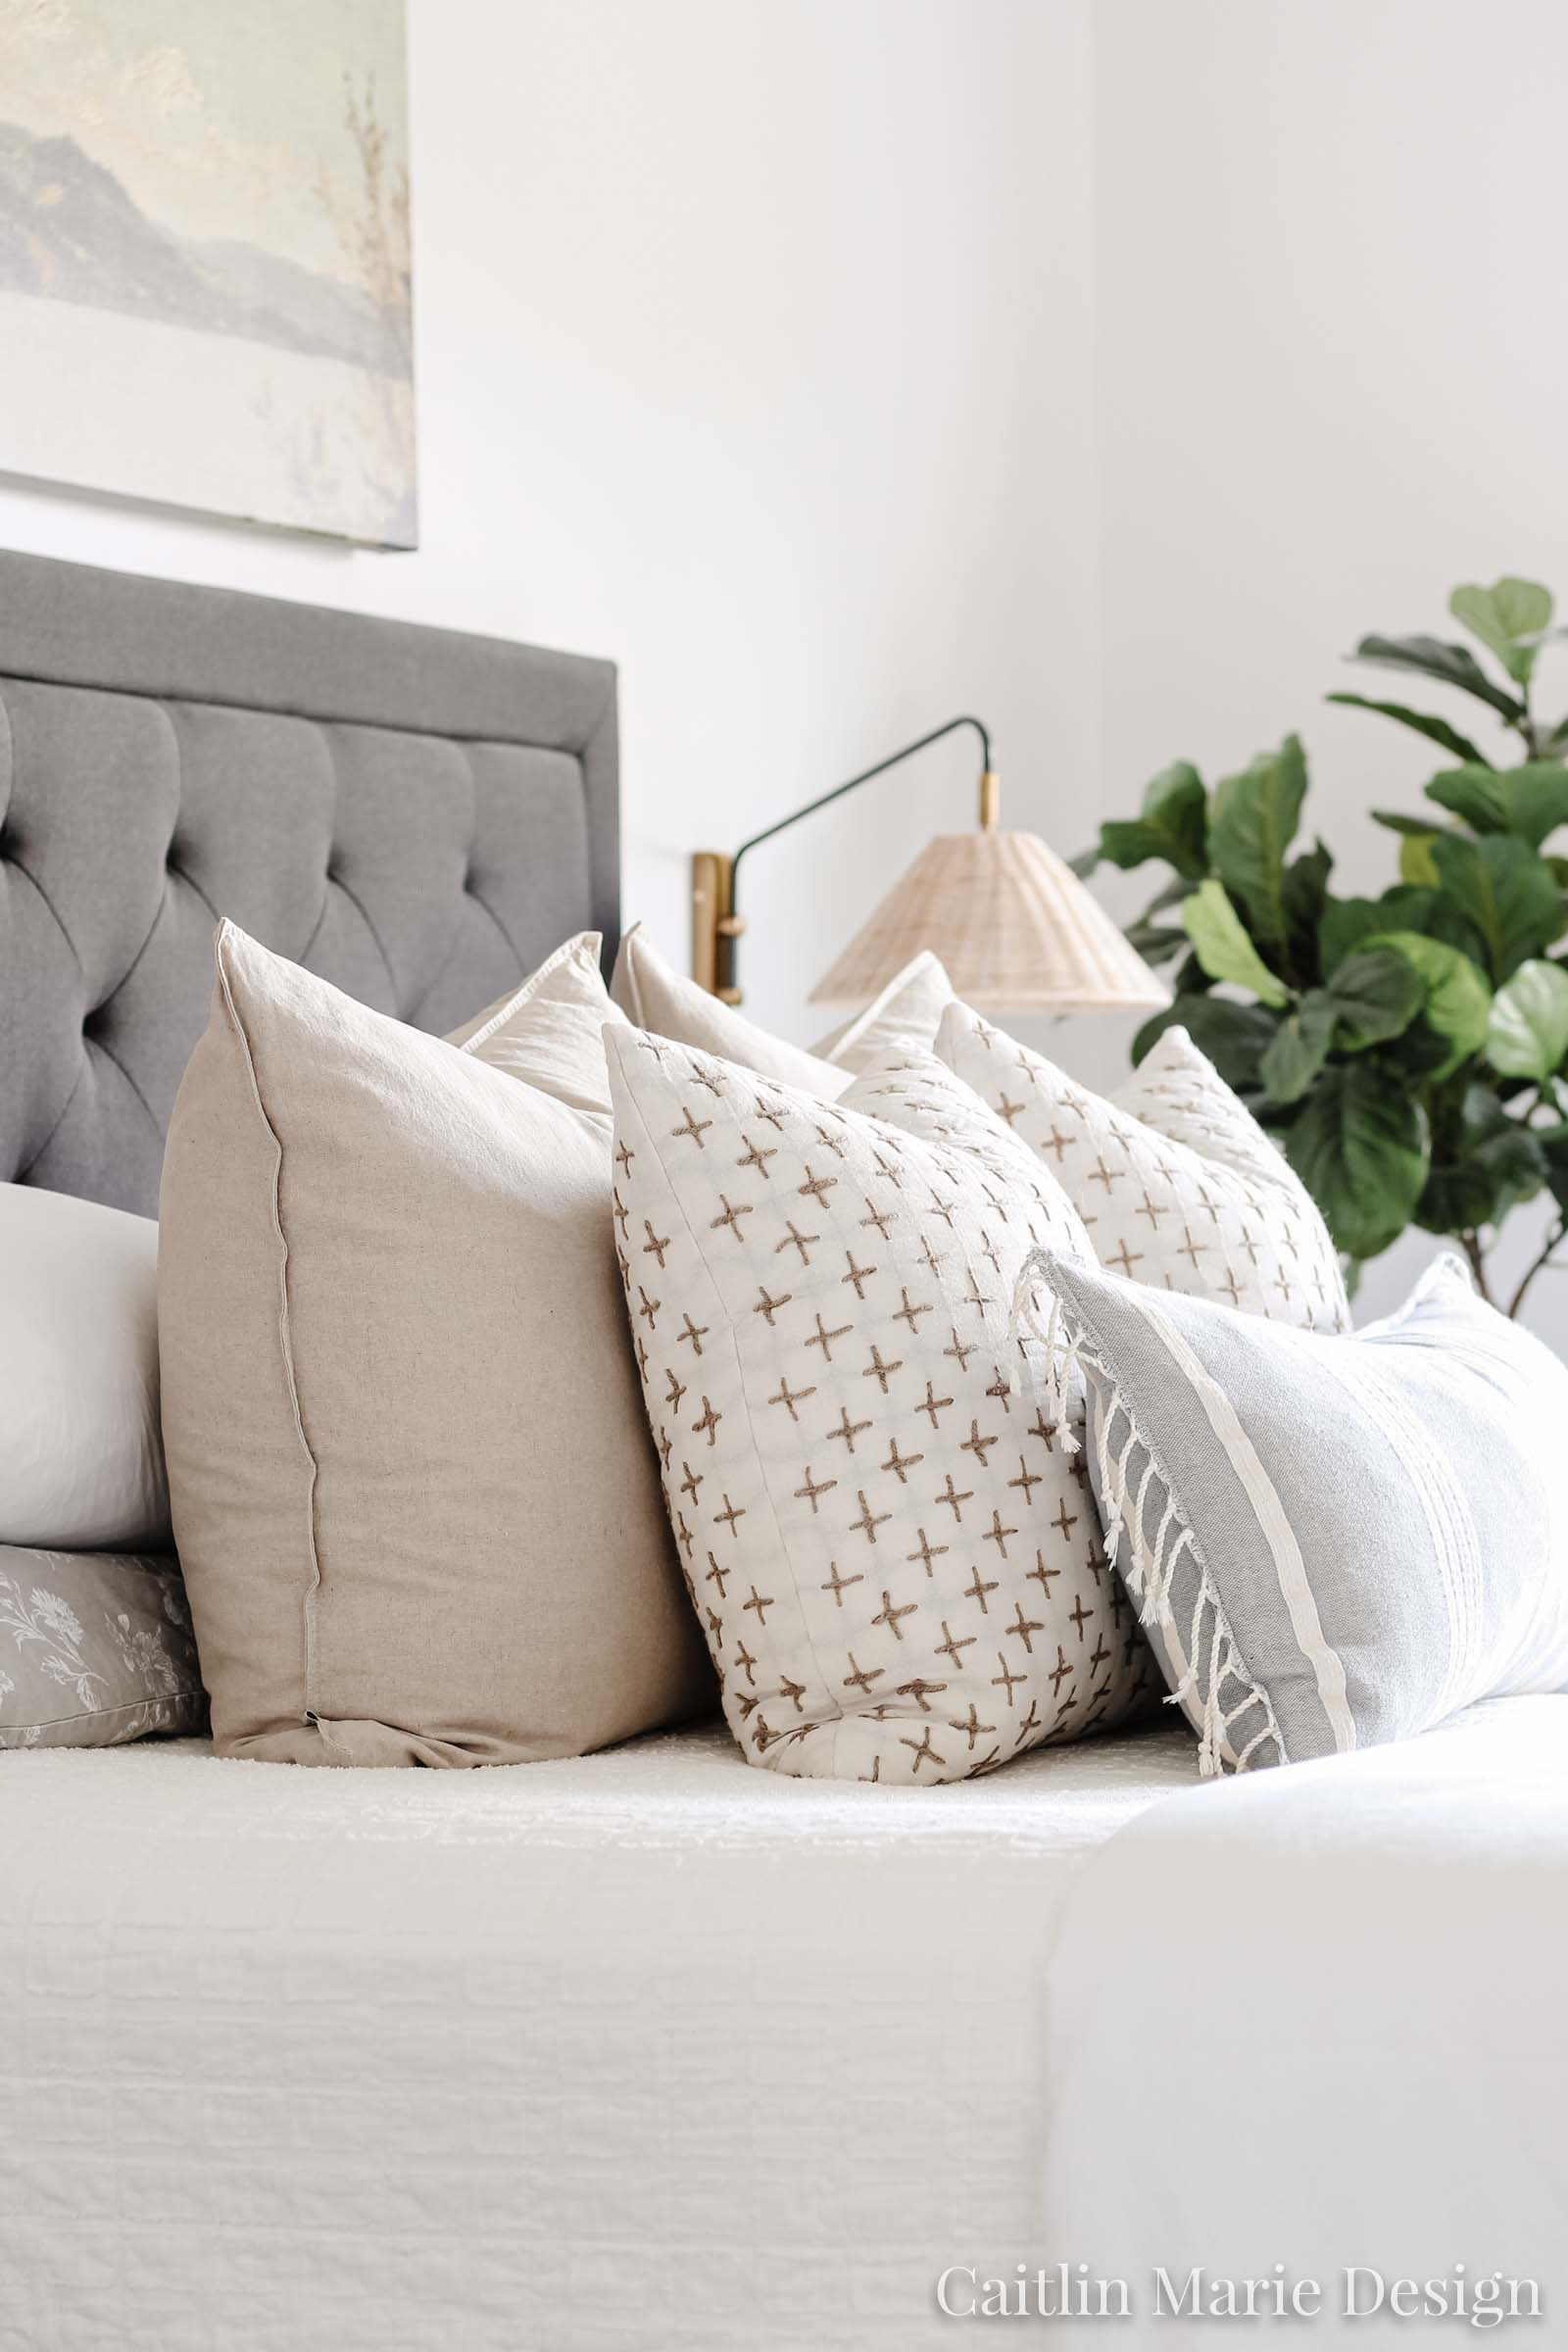 Coastal master bedroom layered throw pillows, rattan sconce, black upholstered headboard